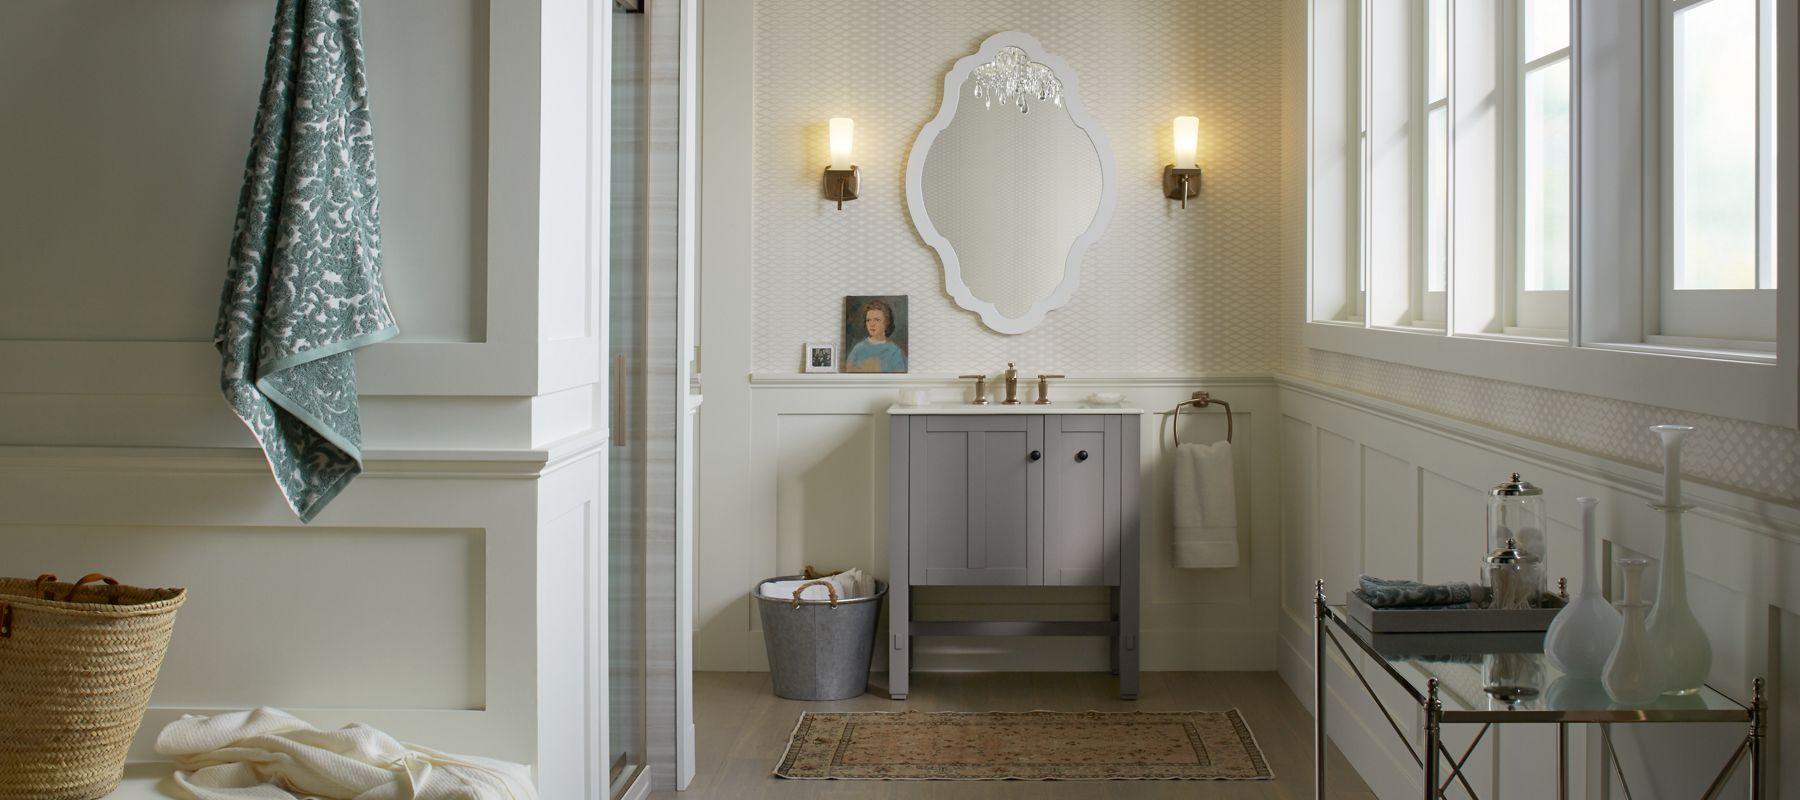 kohler bathroom design service kohler kohler bathroom fixtures home design ideas